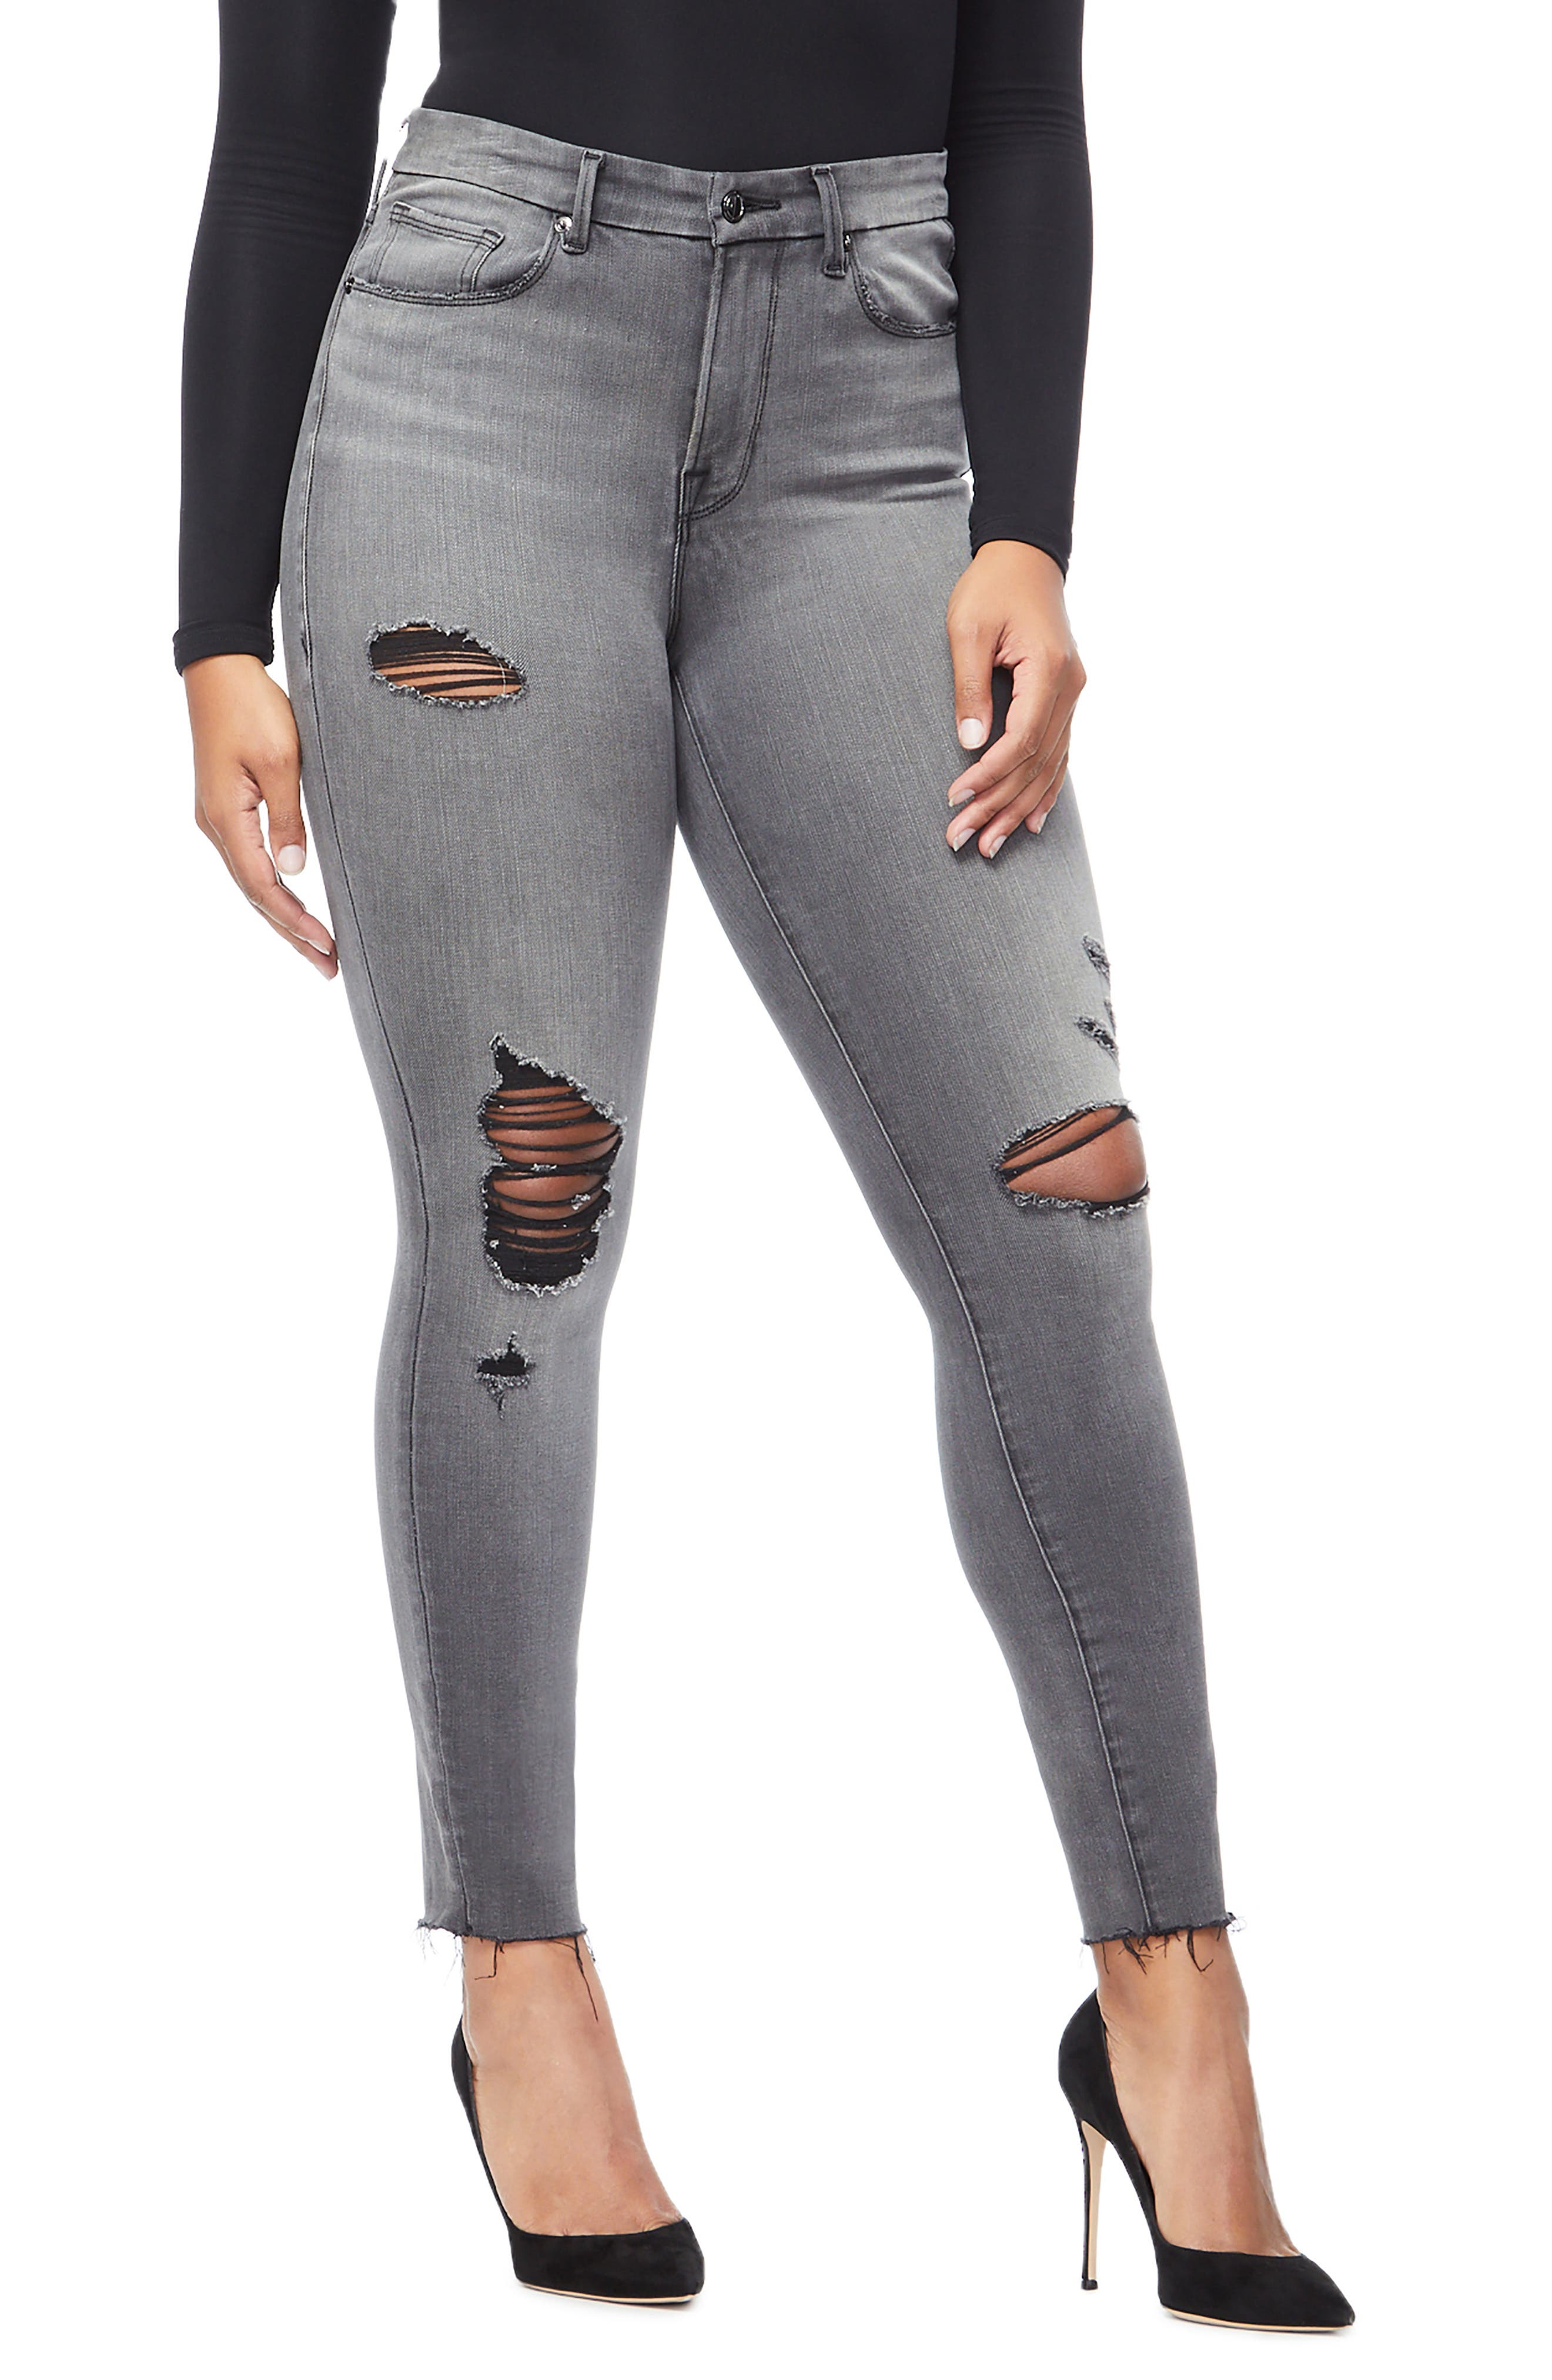 GOOD AMERICAN, Good Waist Ripped High Waist Skinny Jeans, Alternate thumbnail 8, color, BLACK044